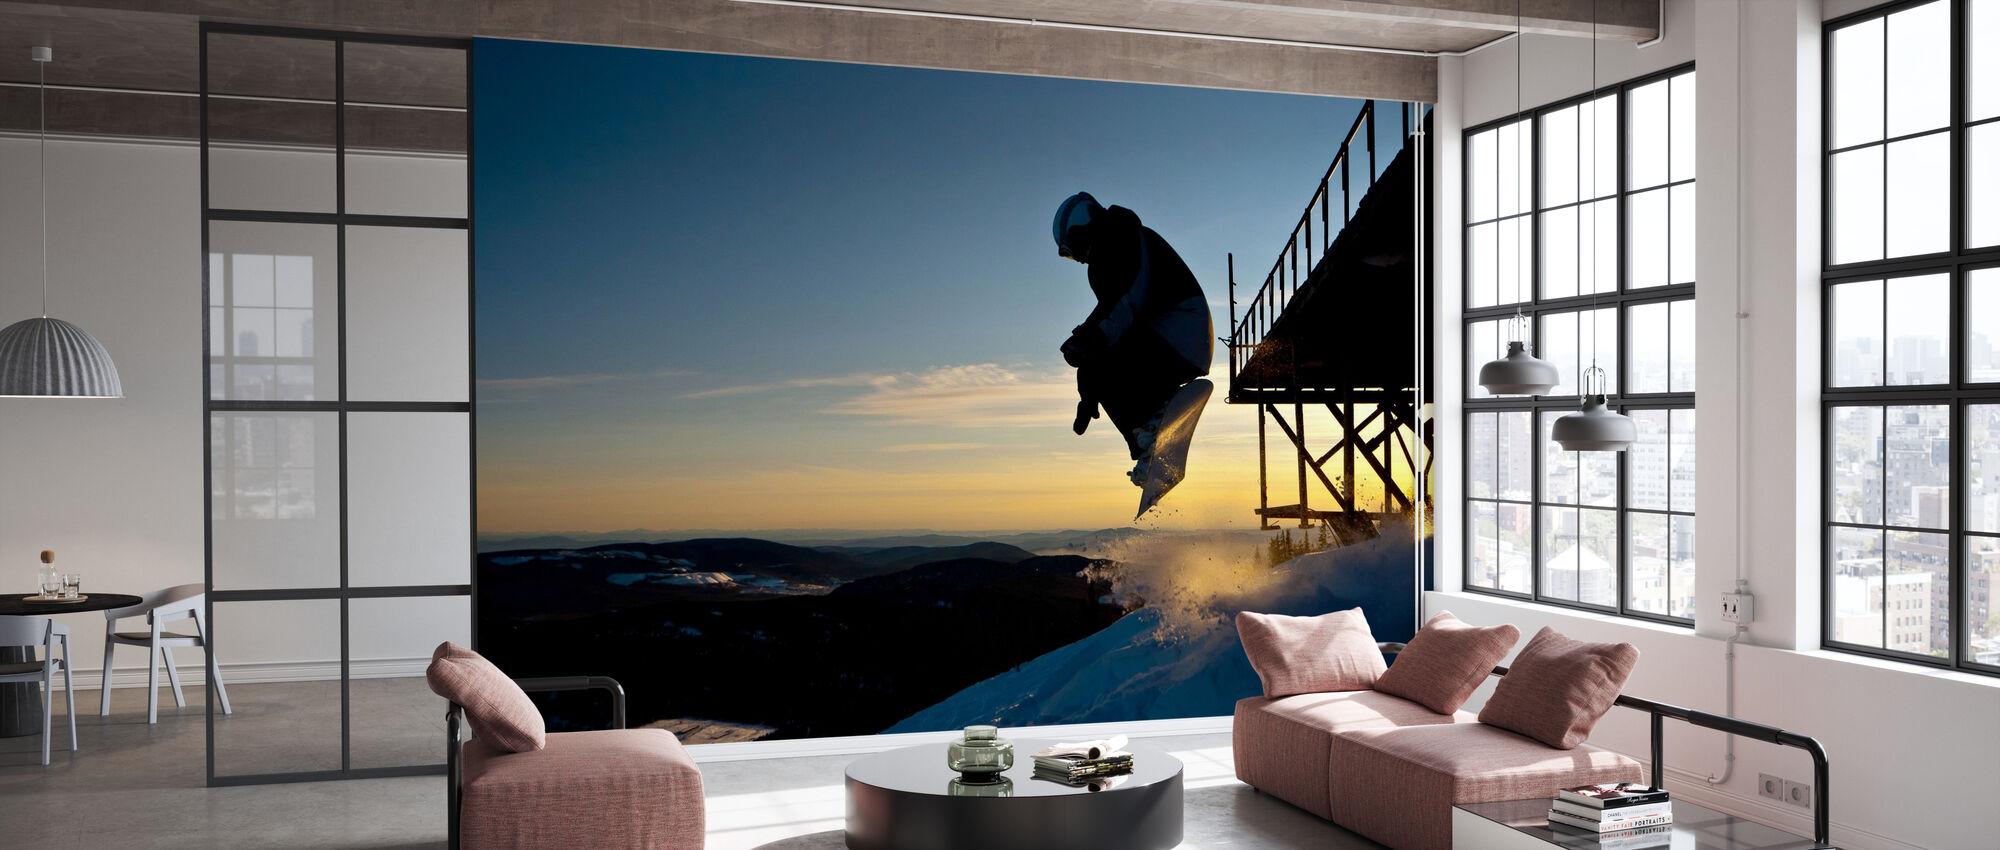 Snowboarder Jump from a Bridge - Wallpaper - Office